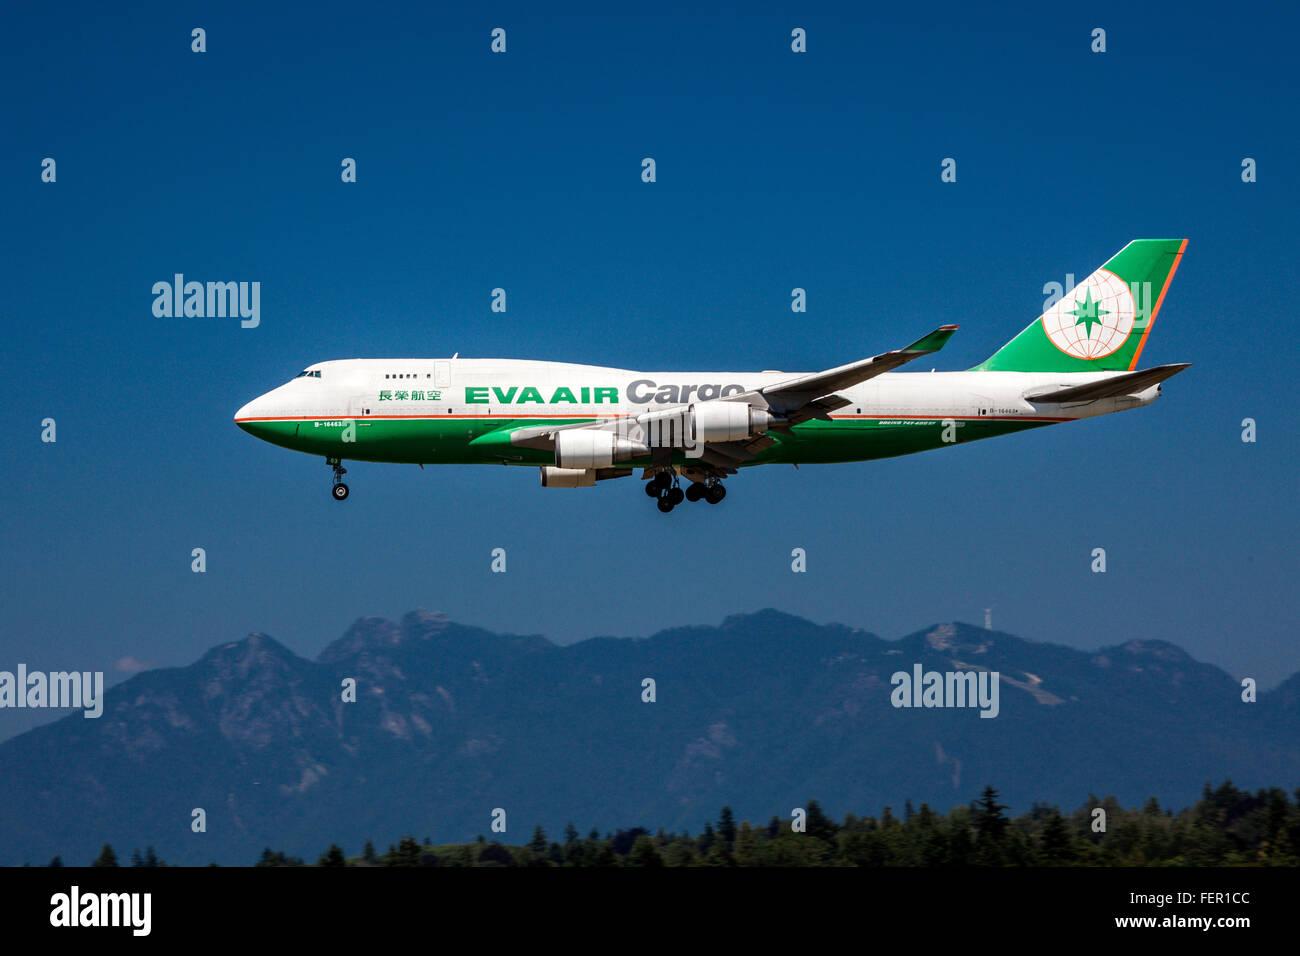 Boeing 747-400 SF. Eva Air Cargo. Landing at YVR, Vancouver. - Stock Image